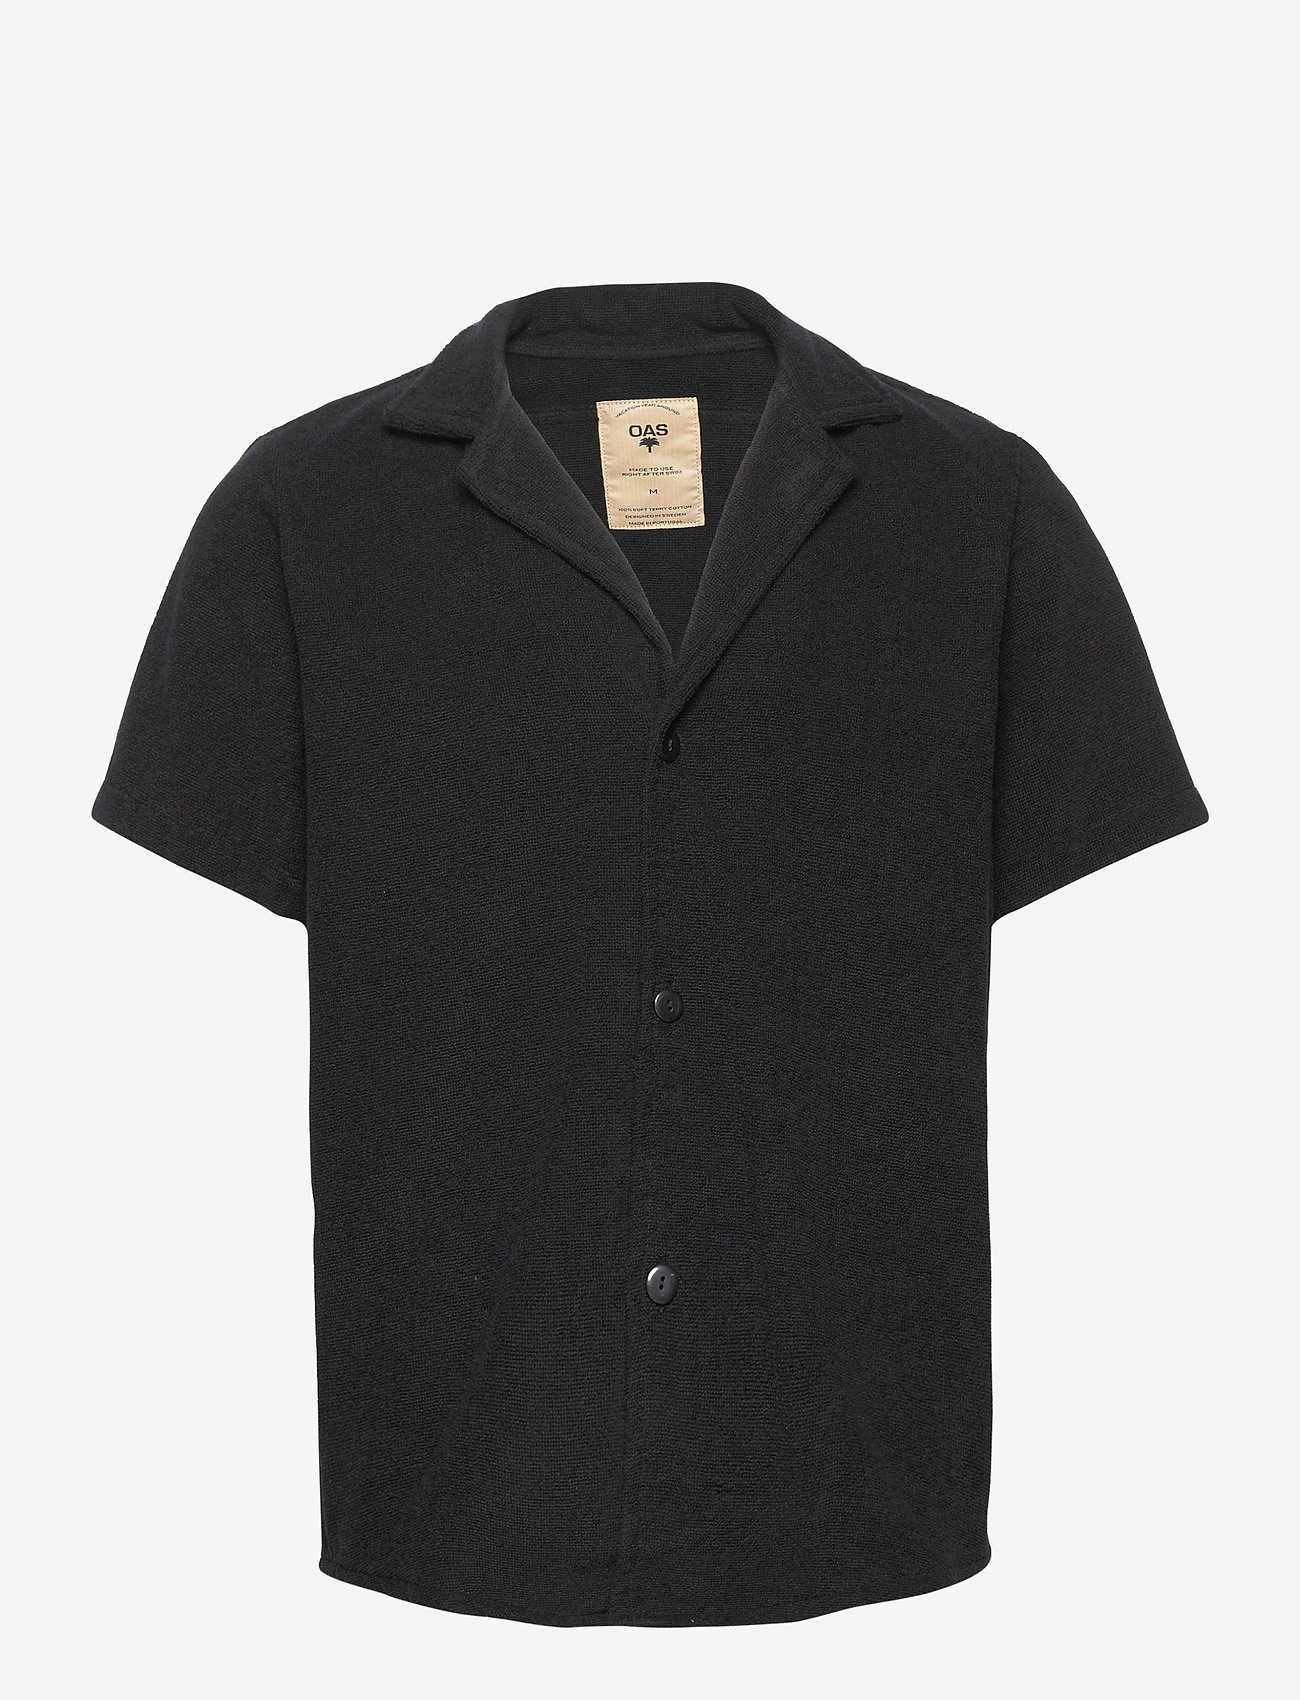 OAS - Black Cuba Terry Shirt - overhemden korte mouwen - black - 0